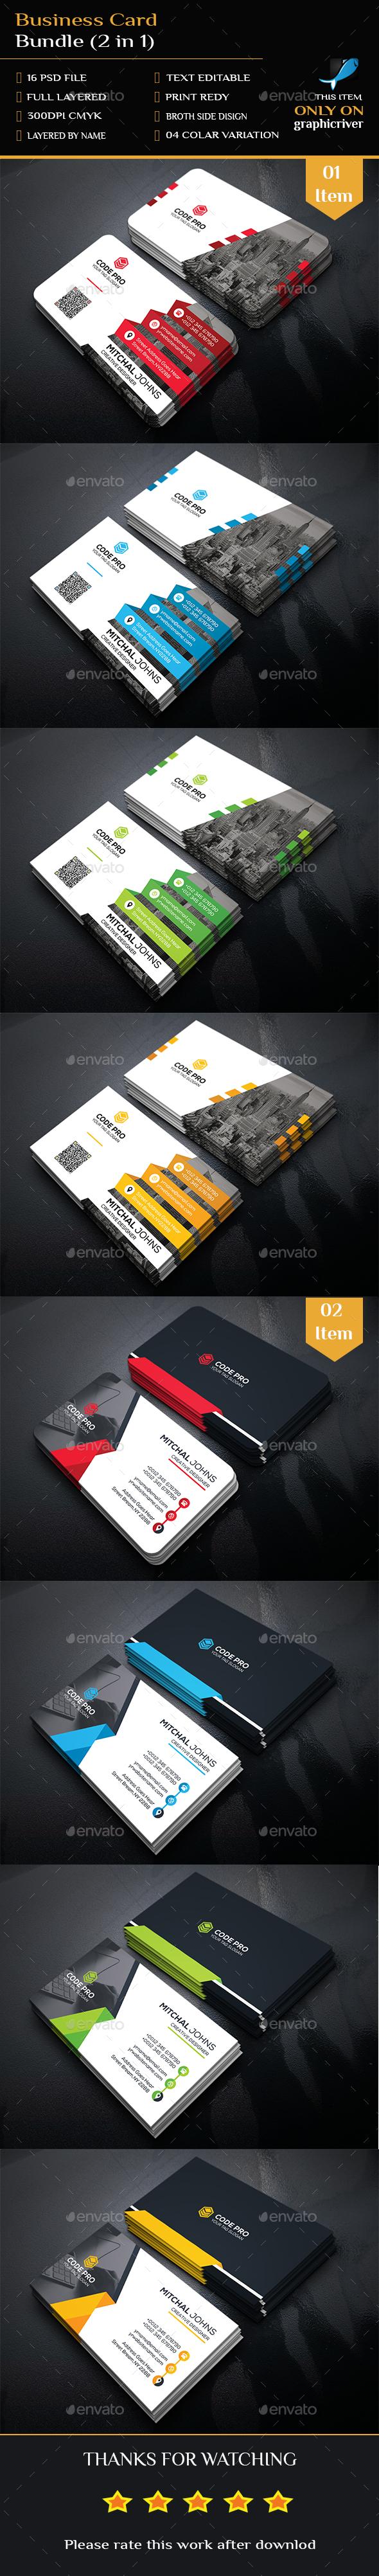 2 Business Card Templates PSD   Business Card Templates ...